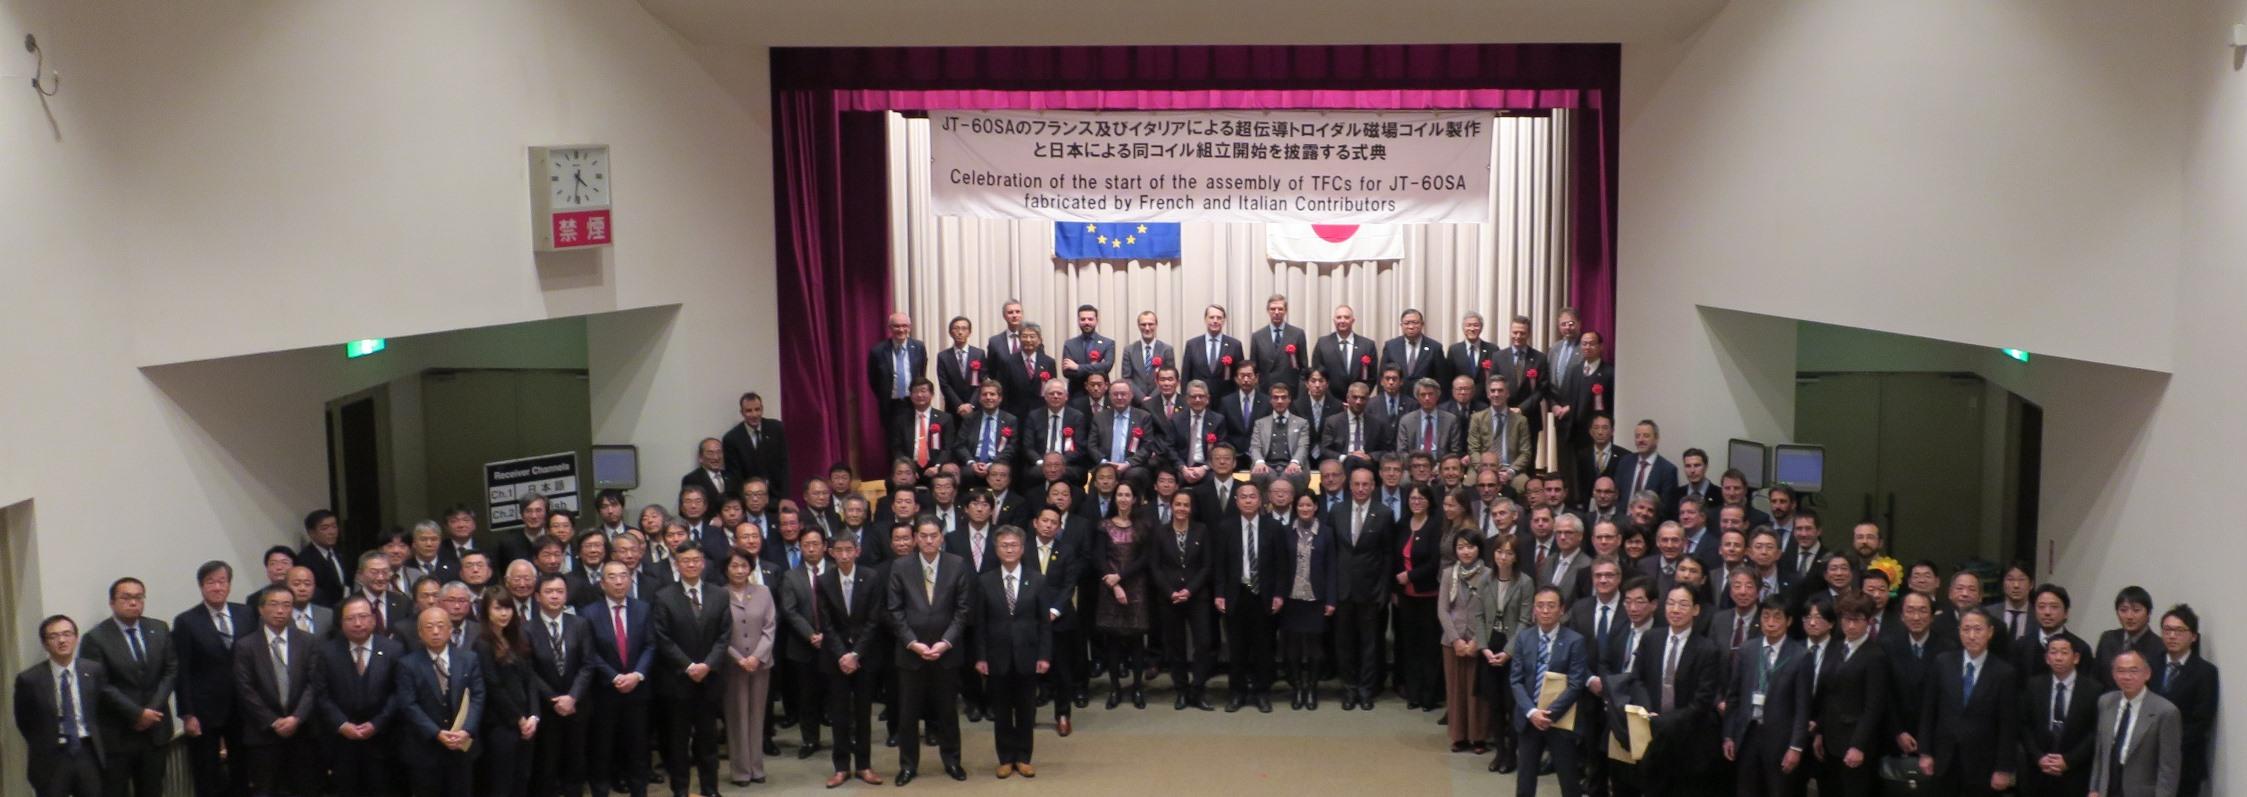 Foto gruppo Naka Giappone